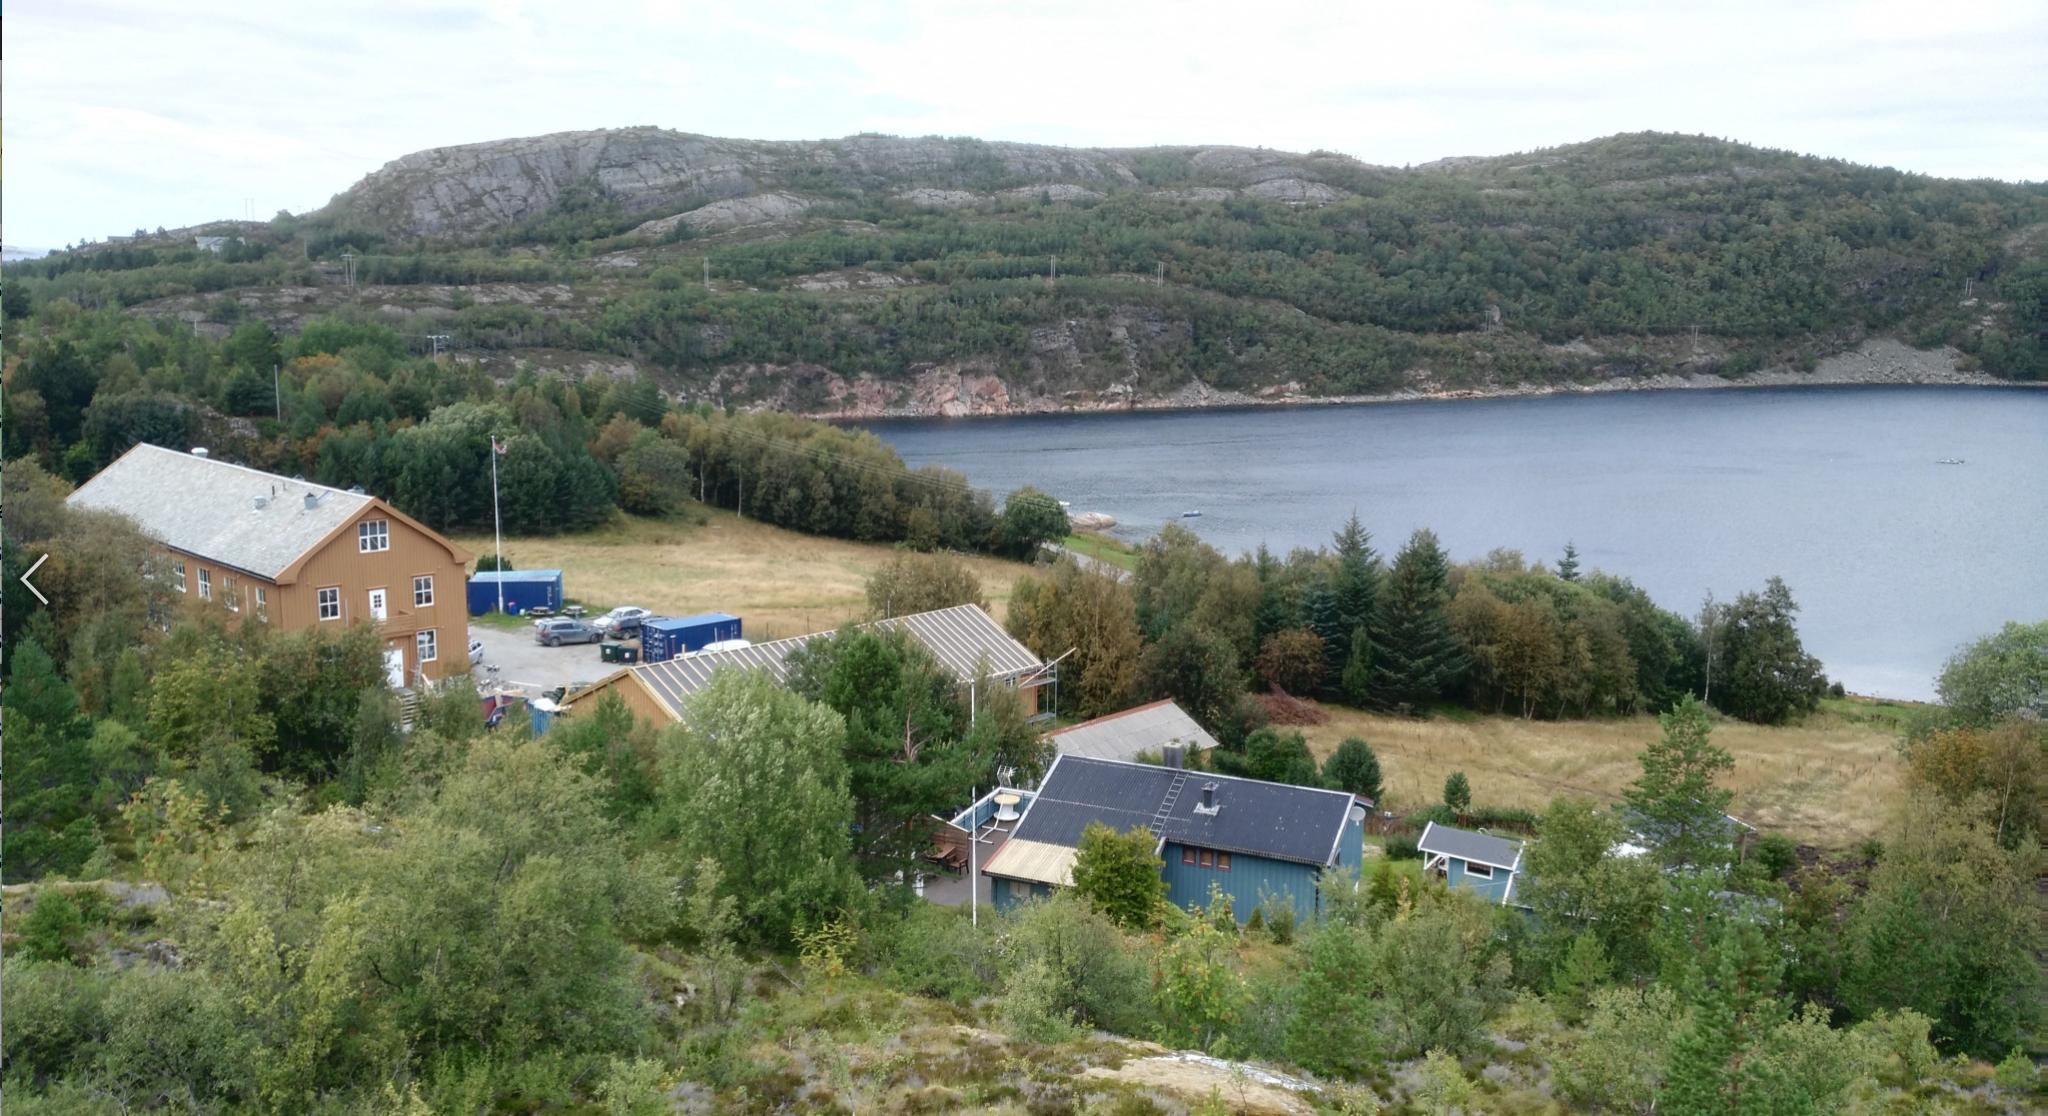 The Bay of Hopavågen - © M. Stockenreiter, Luna Benitez Requena, Sabine Schultes and Patrick Fink